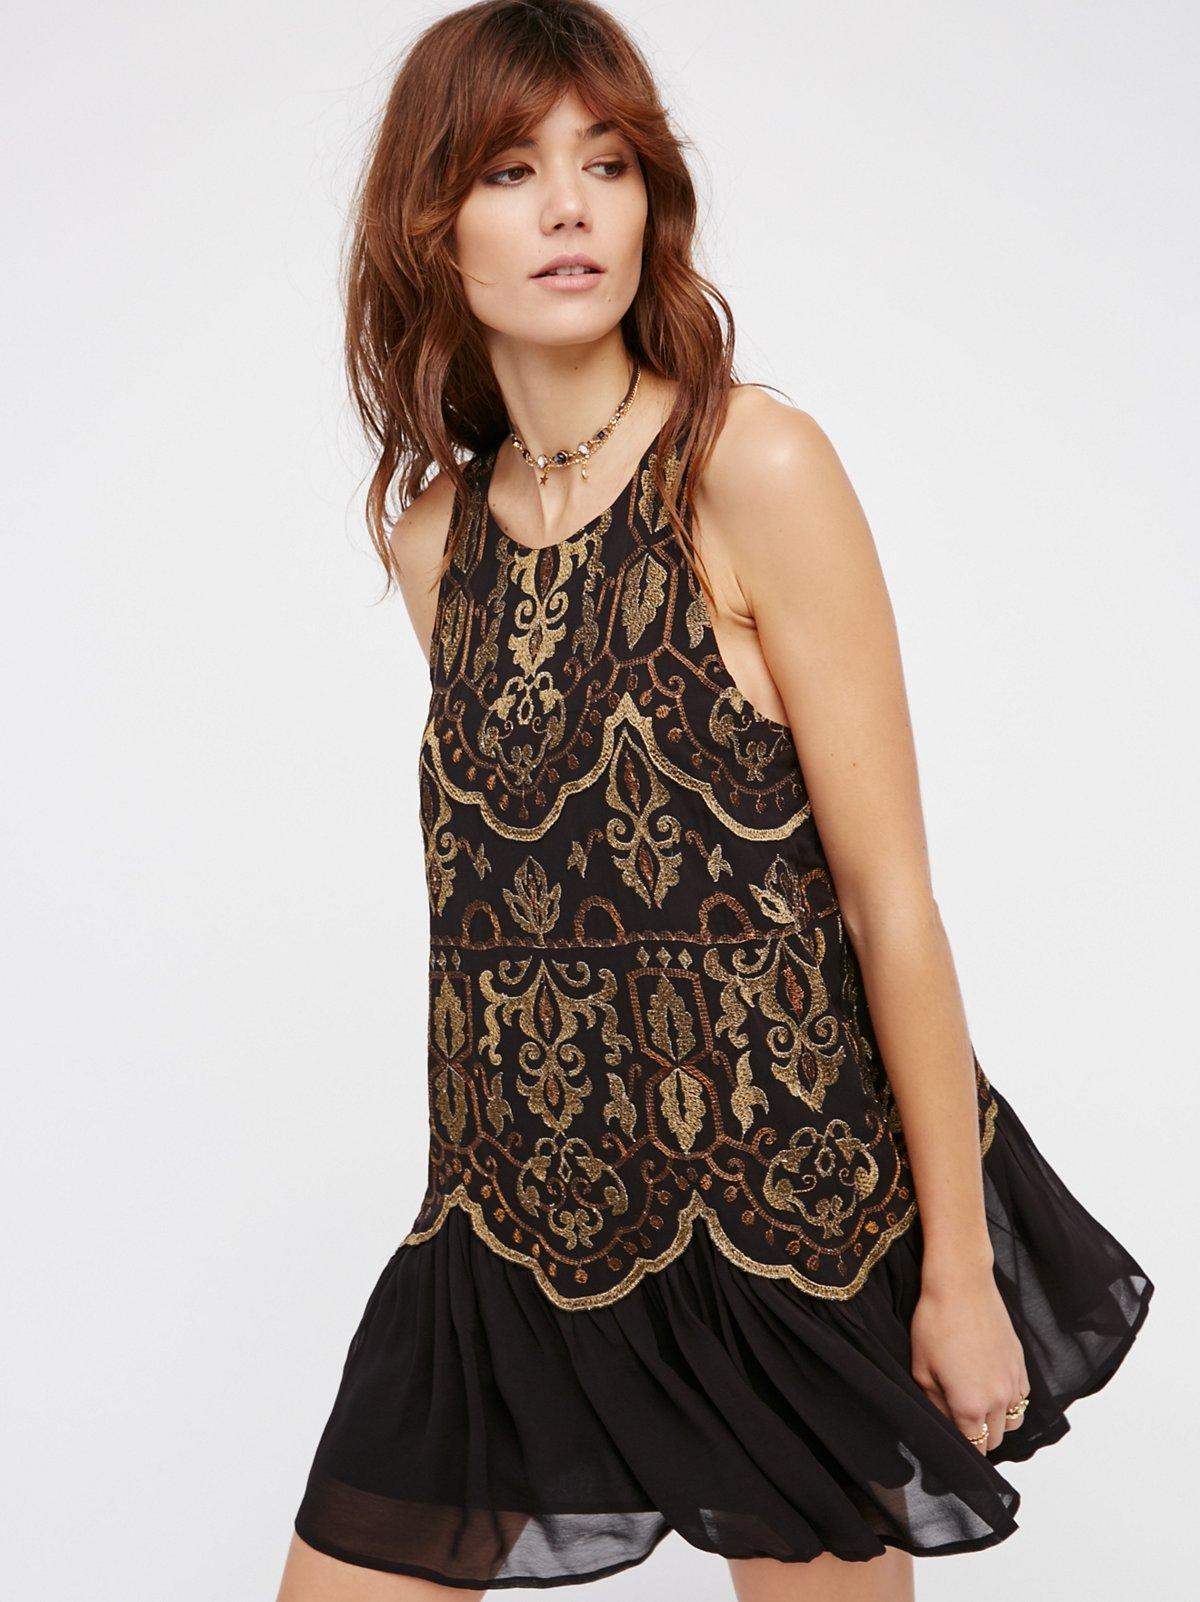 secrets mini dress at free clothing boutique